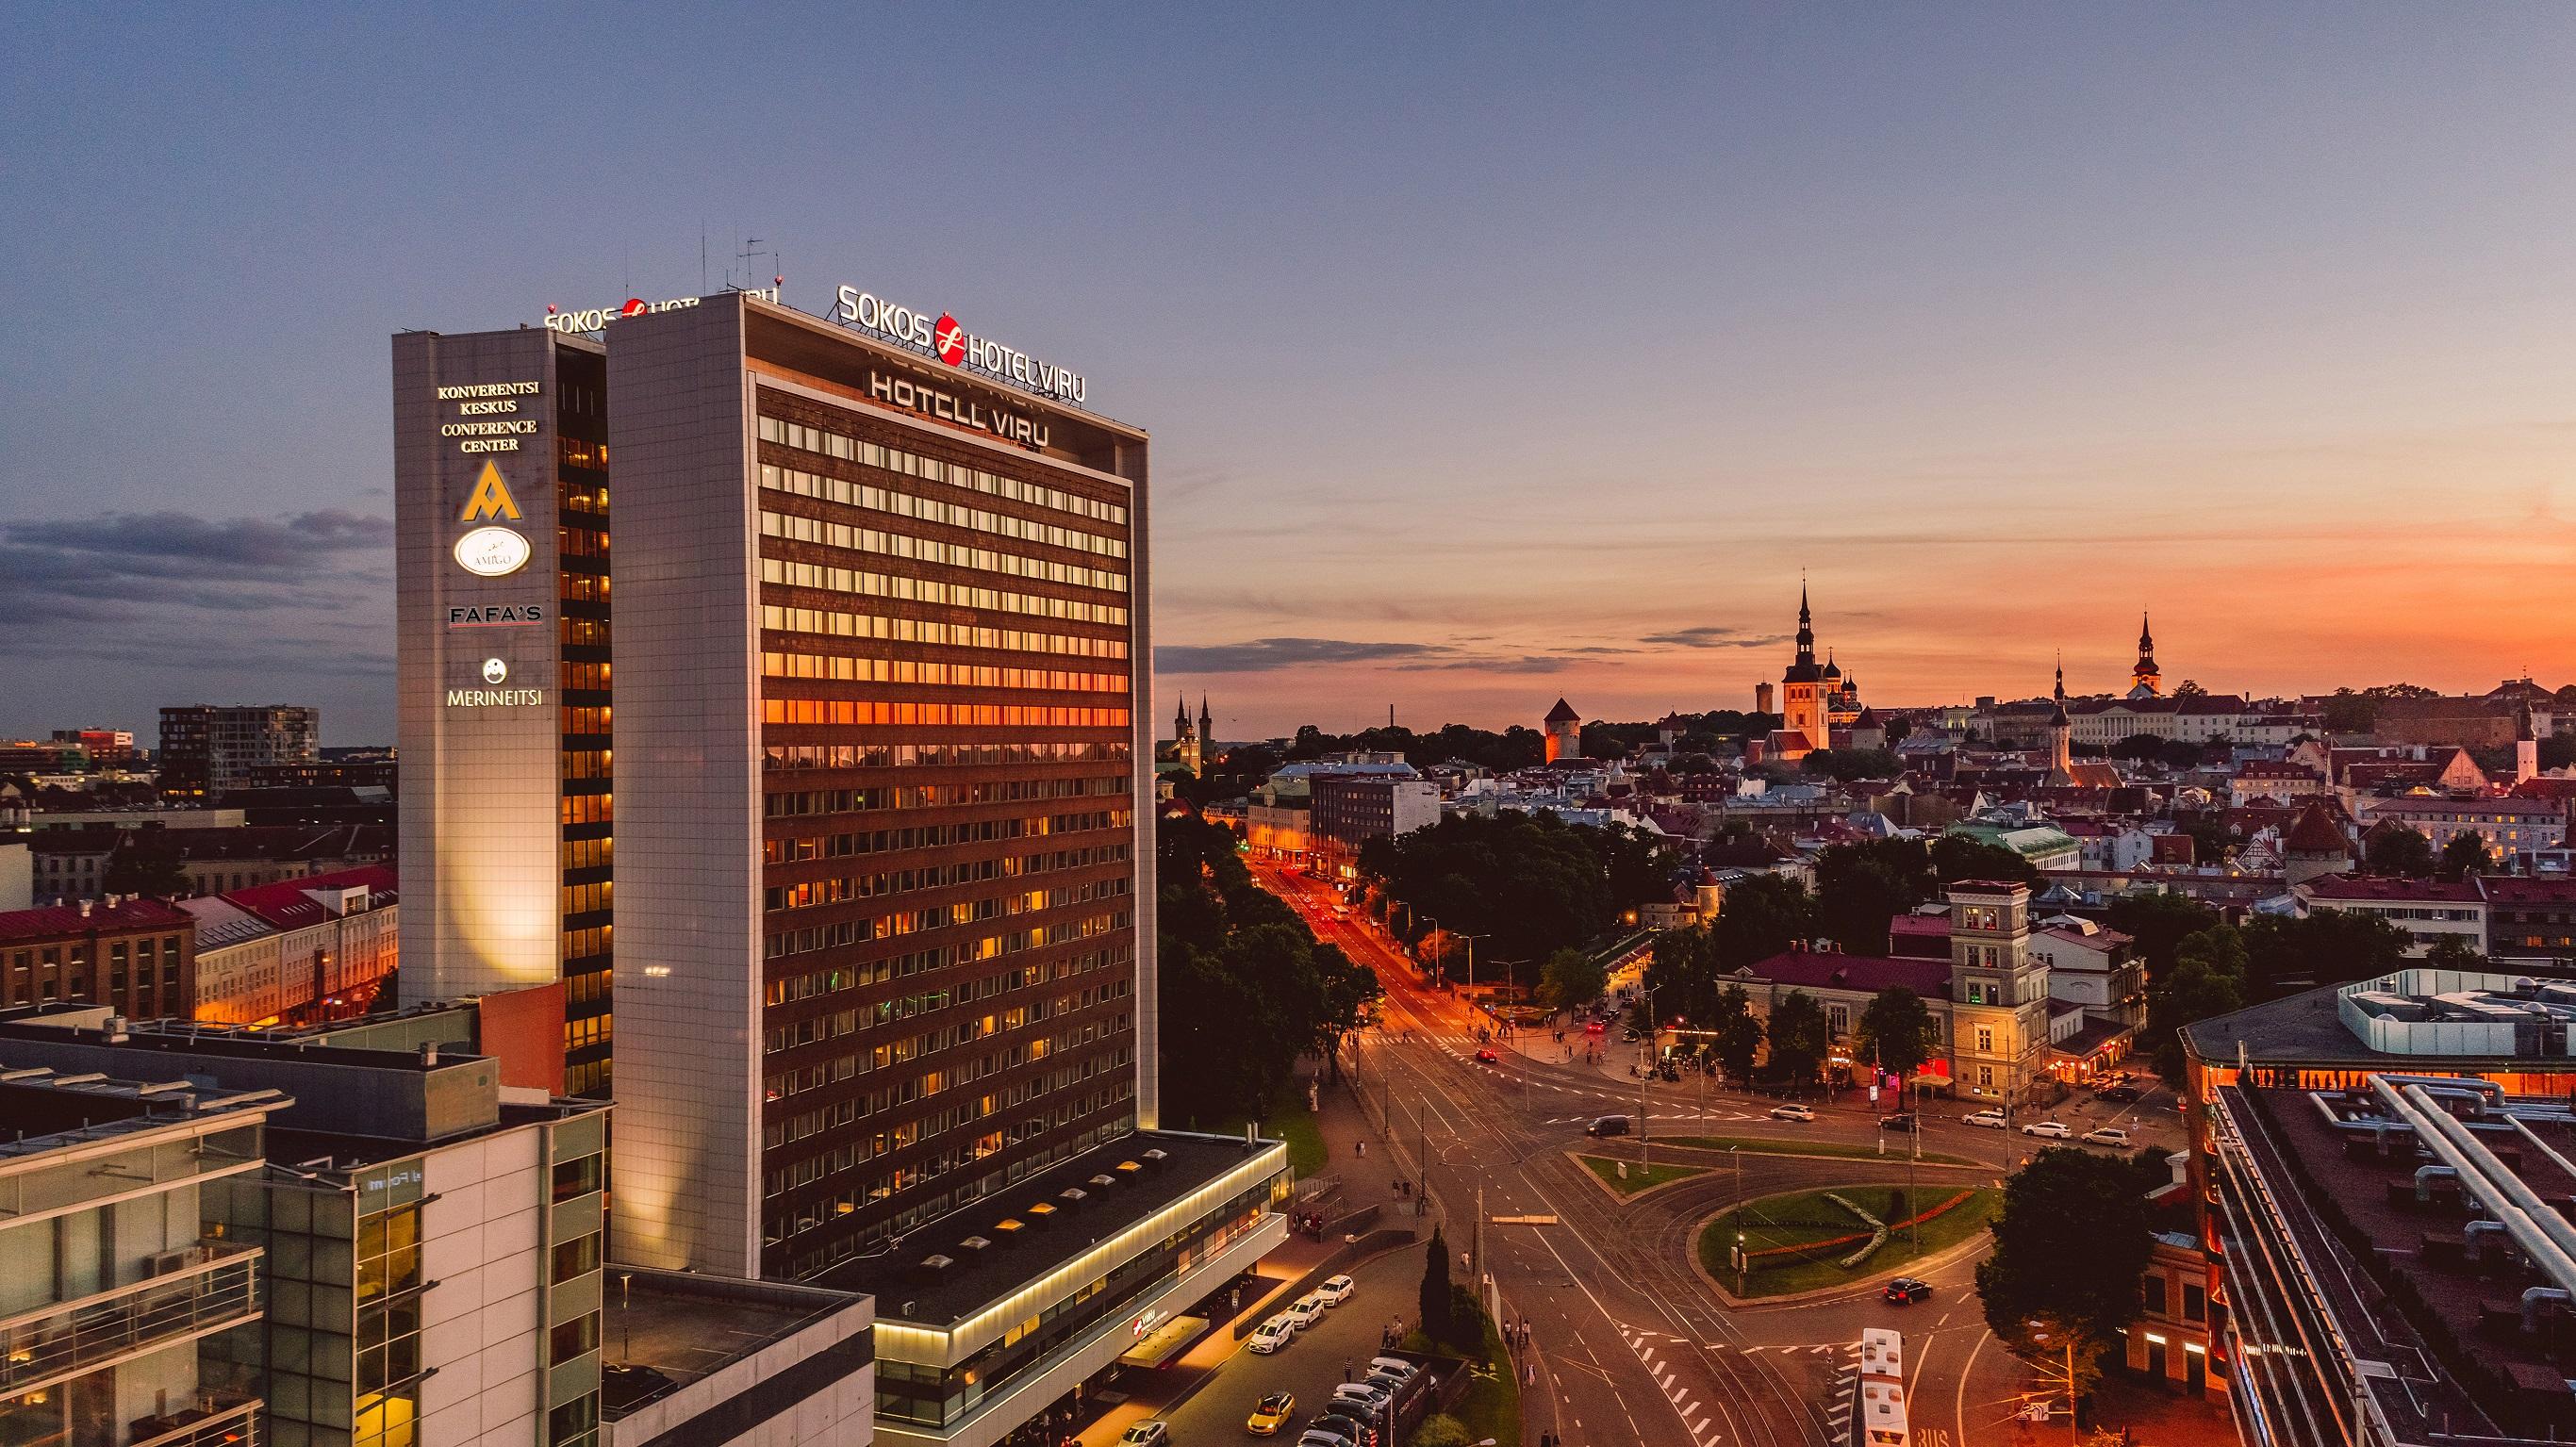 Sokos Hotel Viro